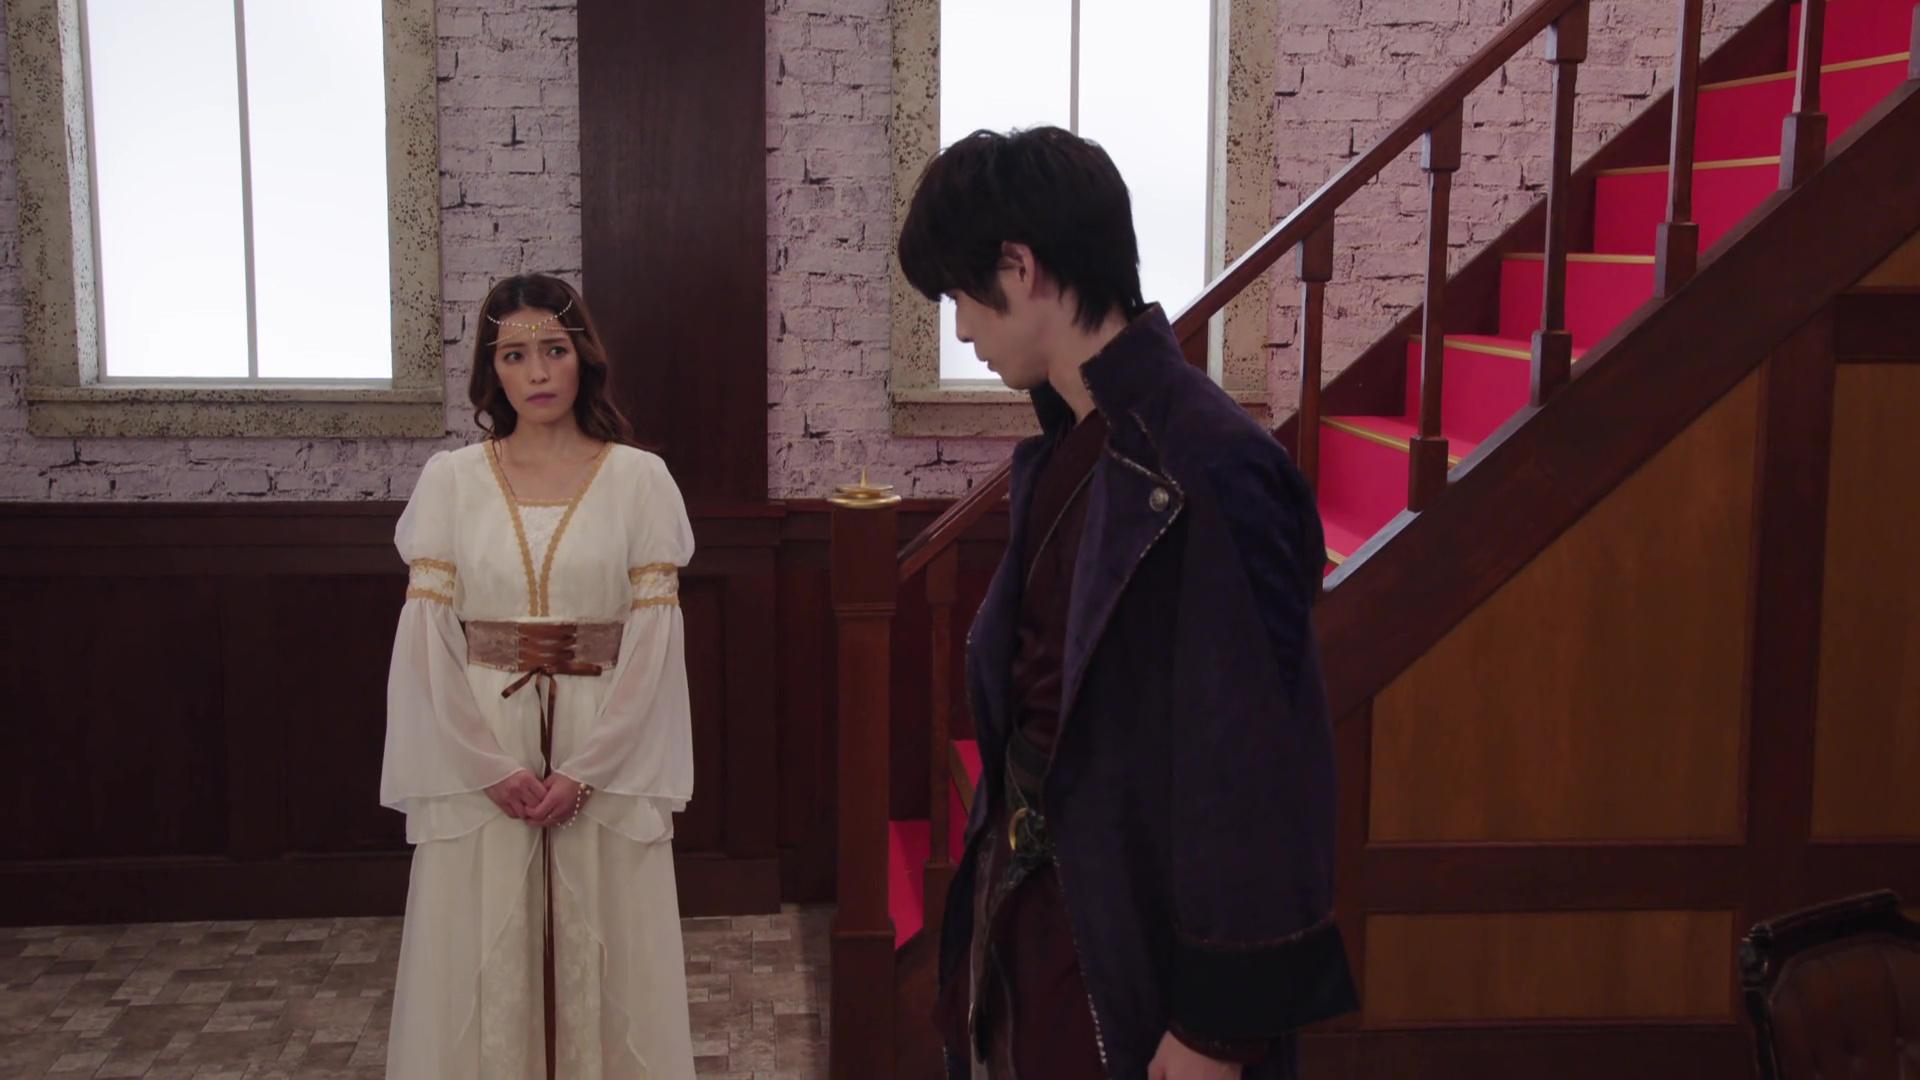 Kamen Rider Saber Episode 3 Recap